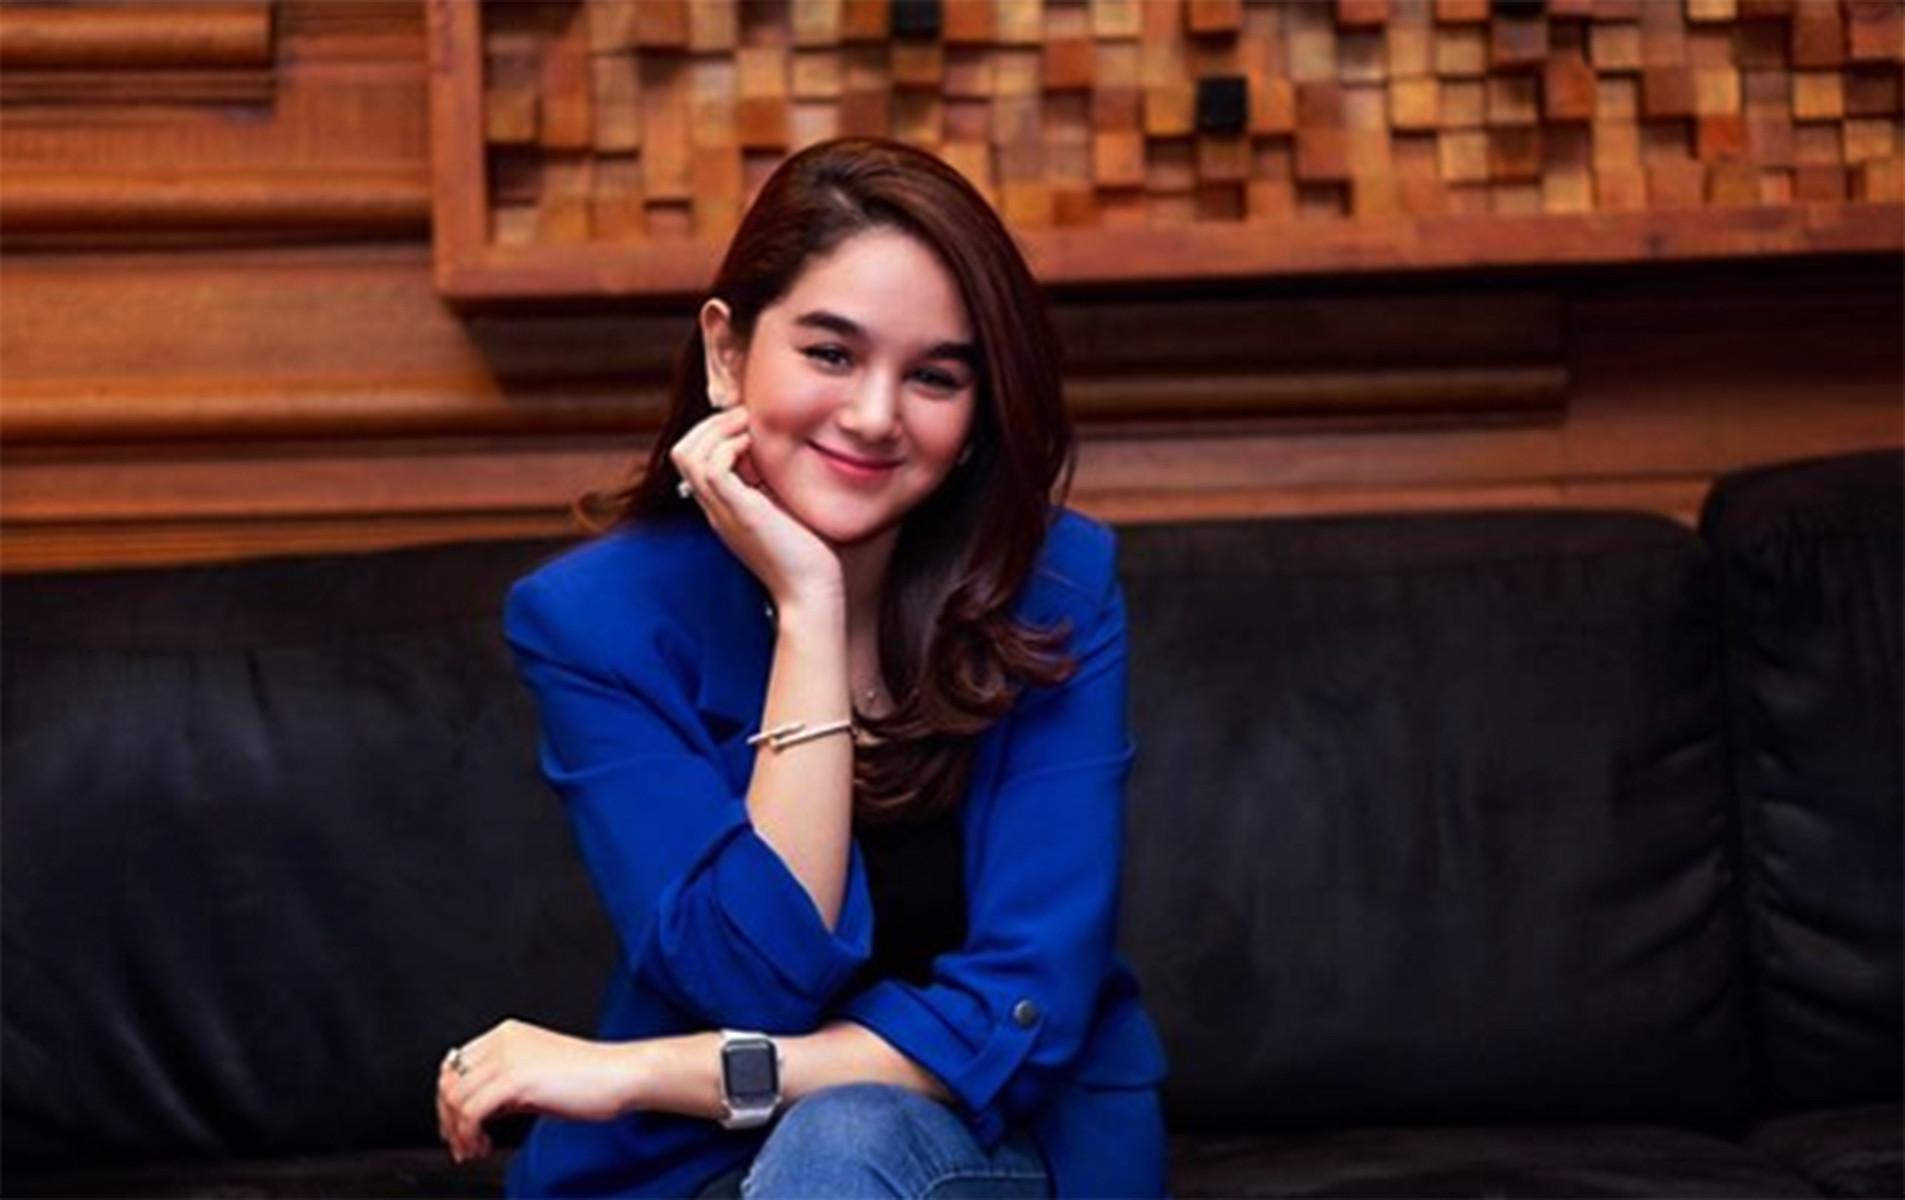 Tak Peduli, Hana Hanifah Tersenyum - JPNN.com